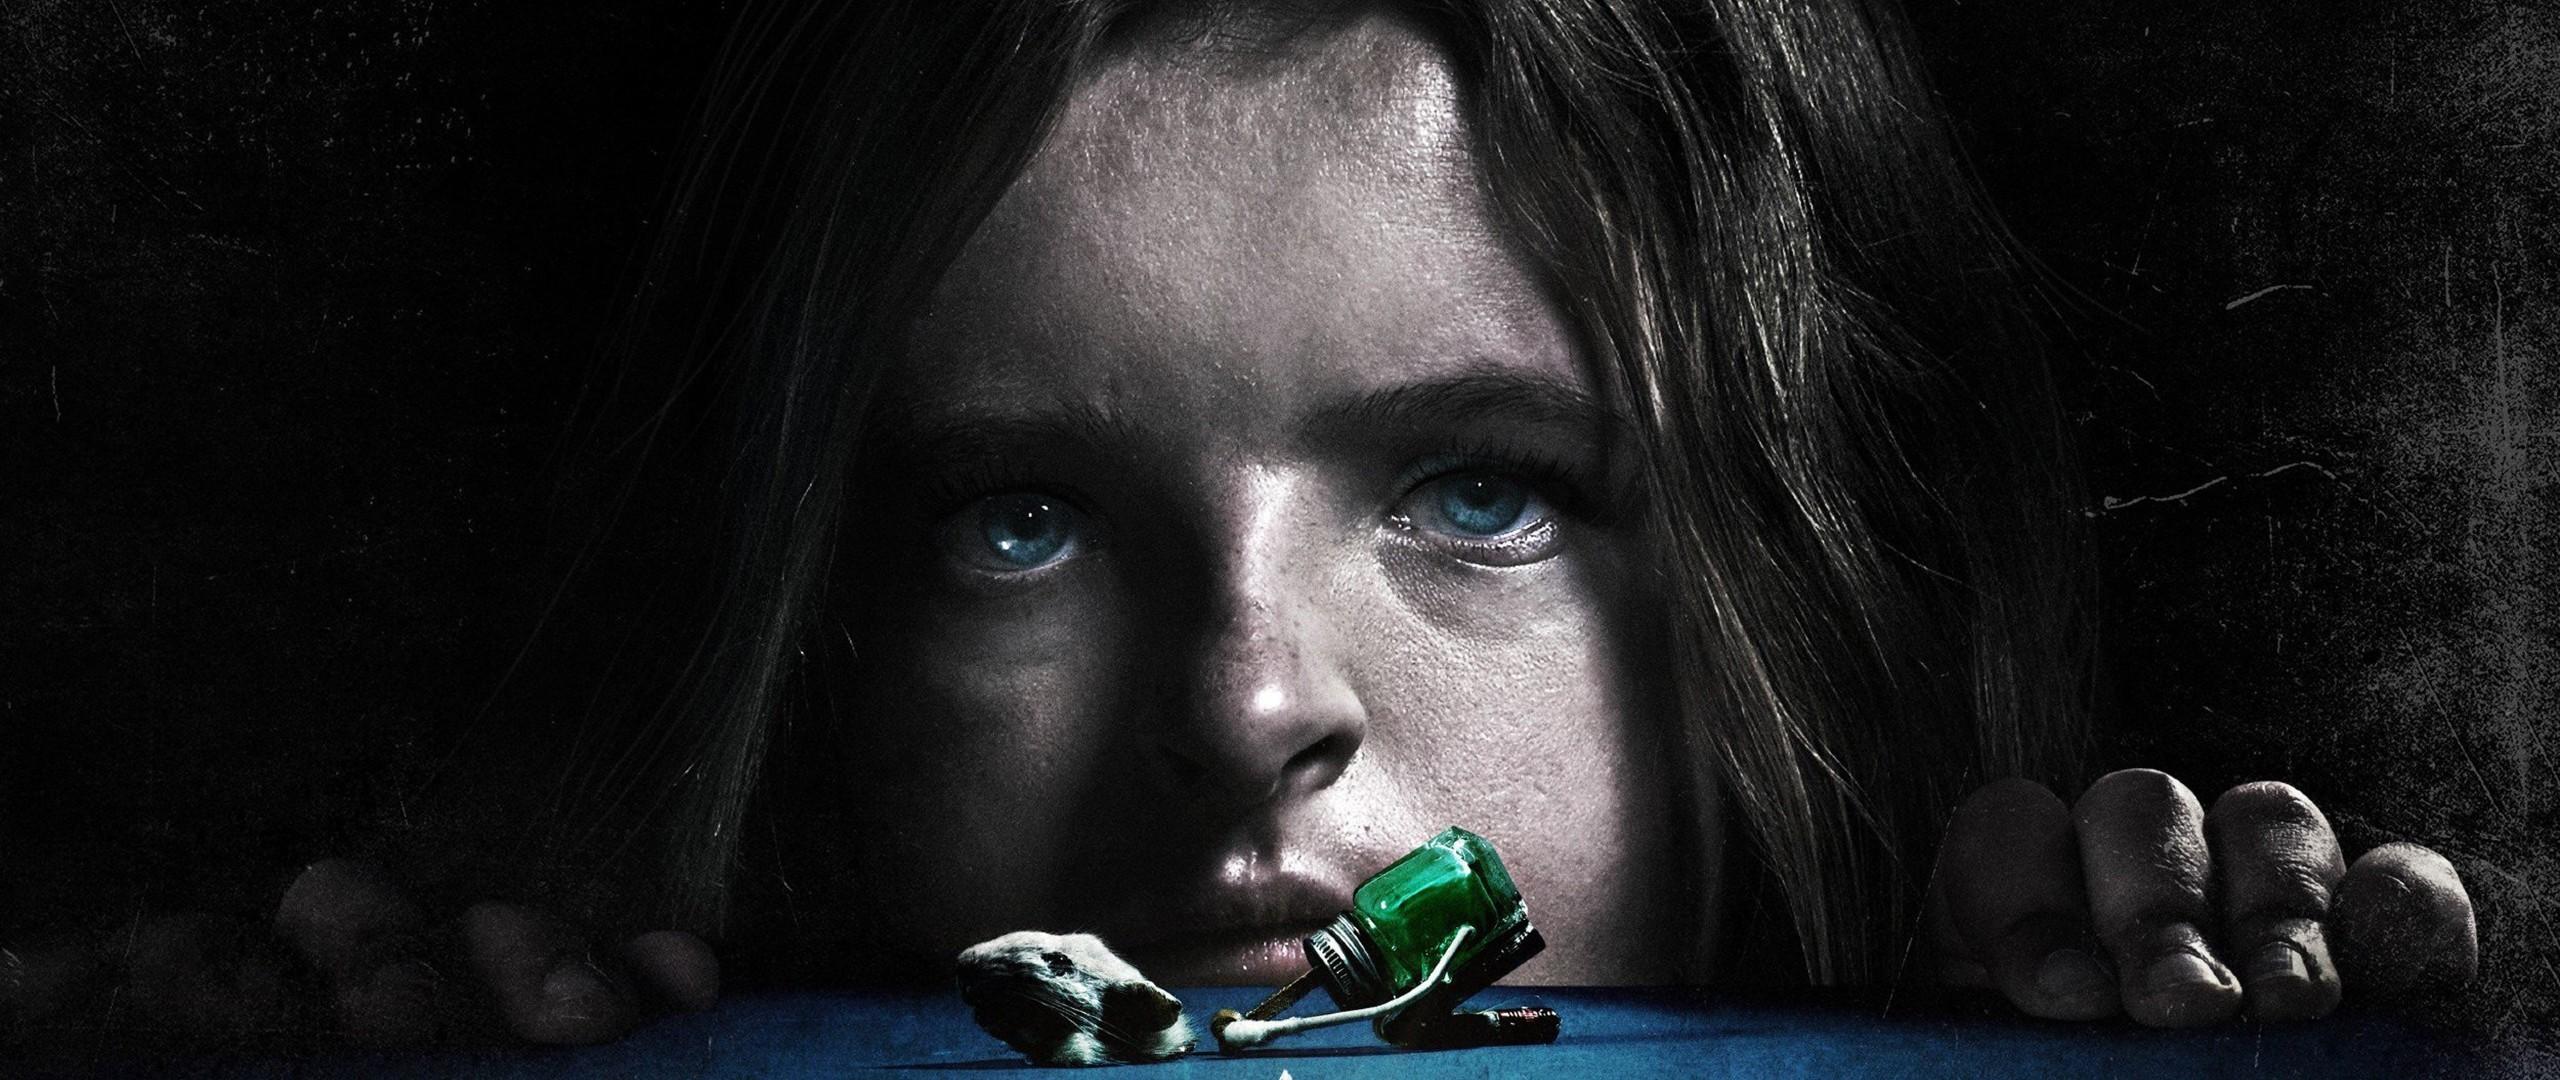 wallpapersden.com_hereditary-2018-movie-poster_2560x1080